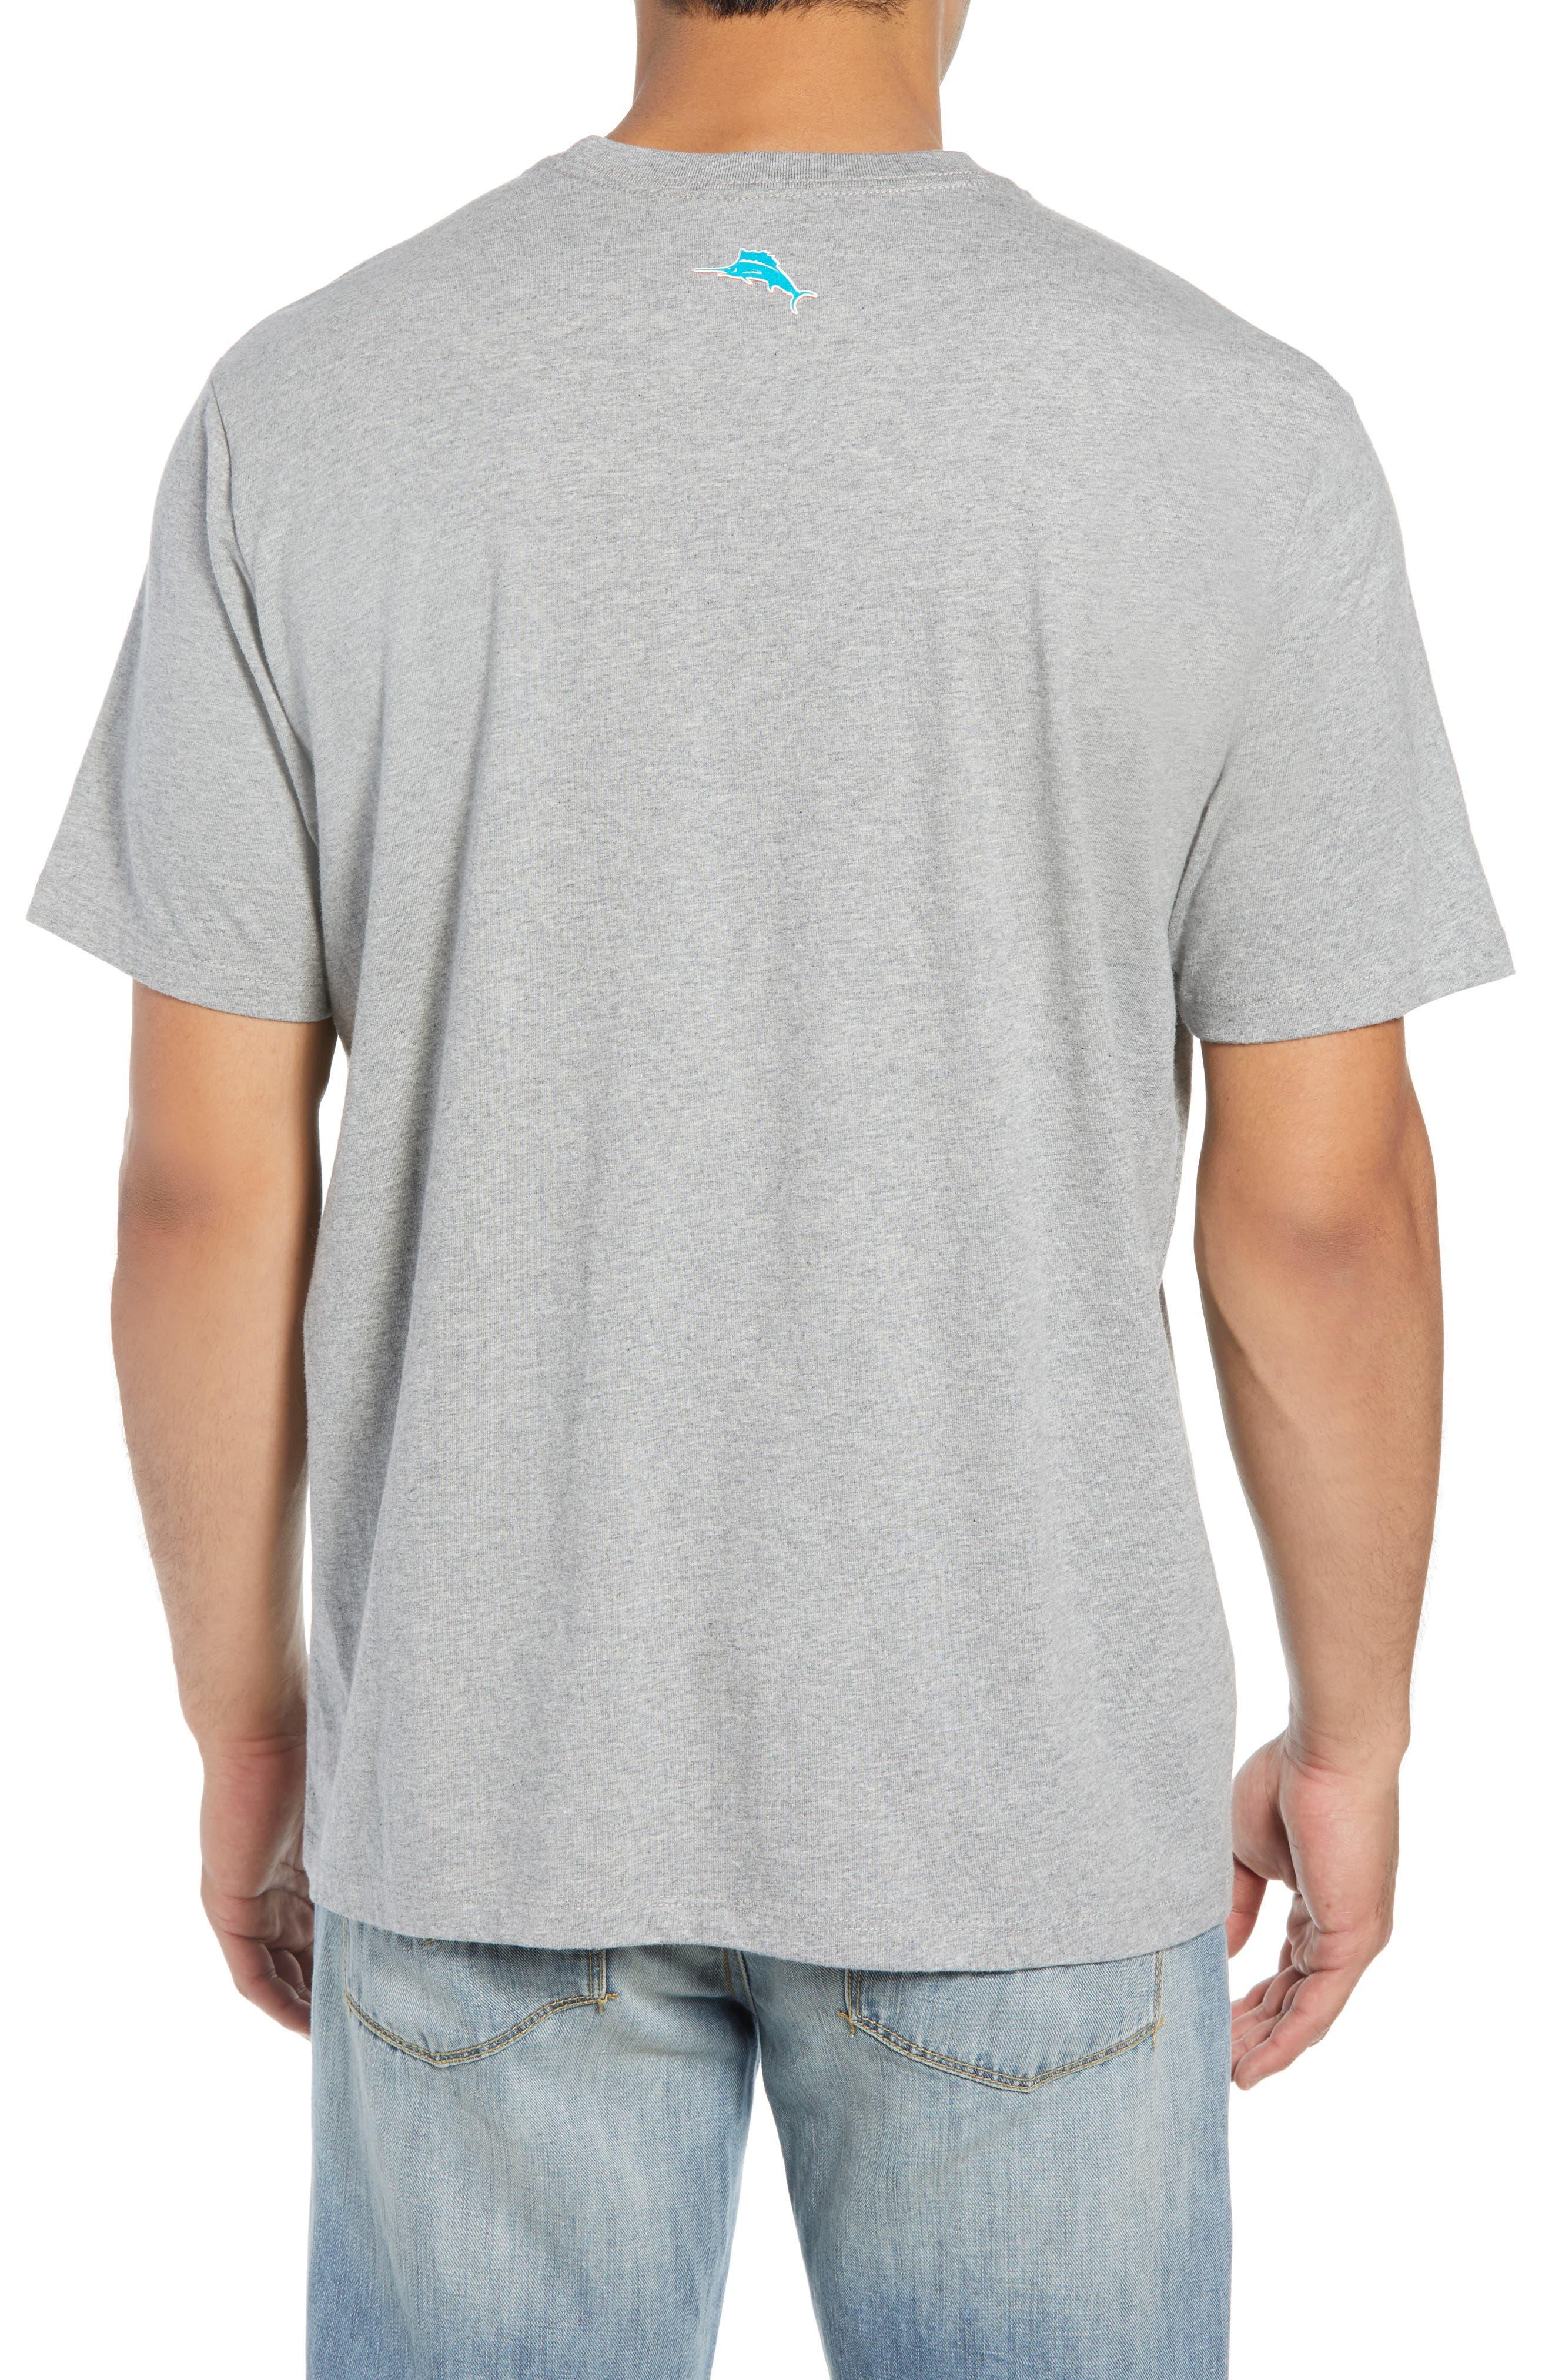 Is Mai Tai on Straight? T-Shirt,                             Alternate thumbnail 2, color,                             GREY HEATHER